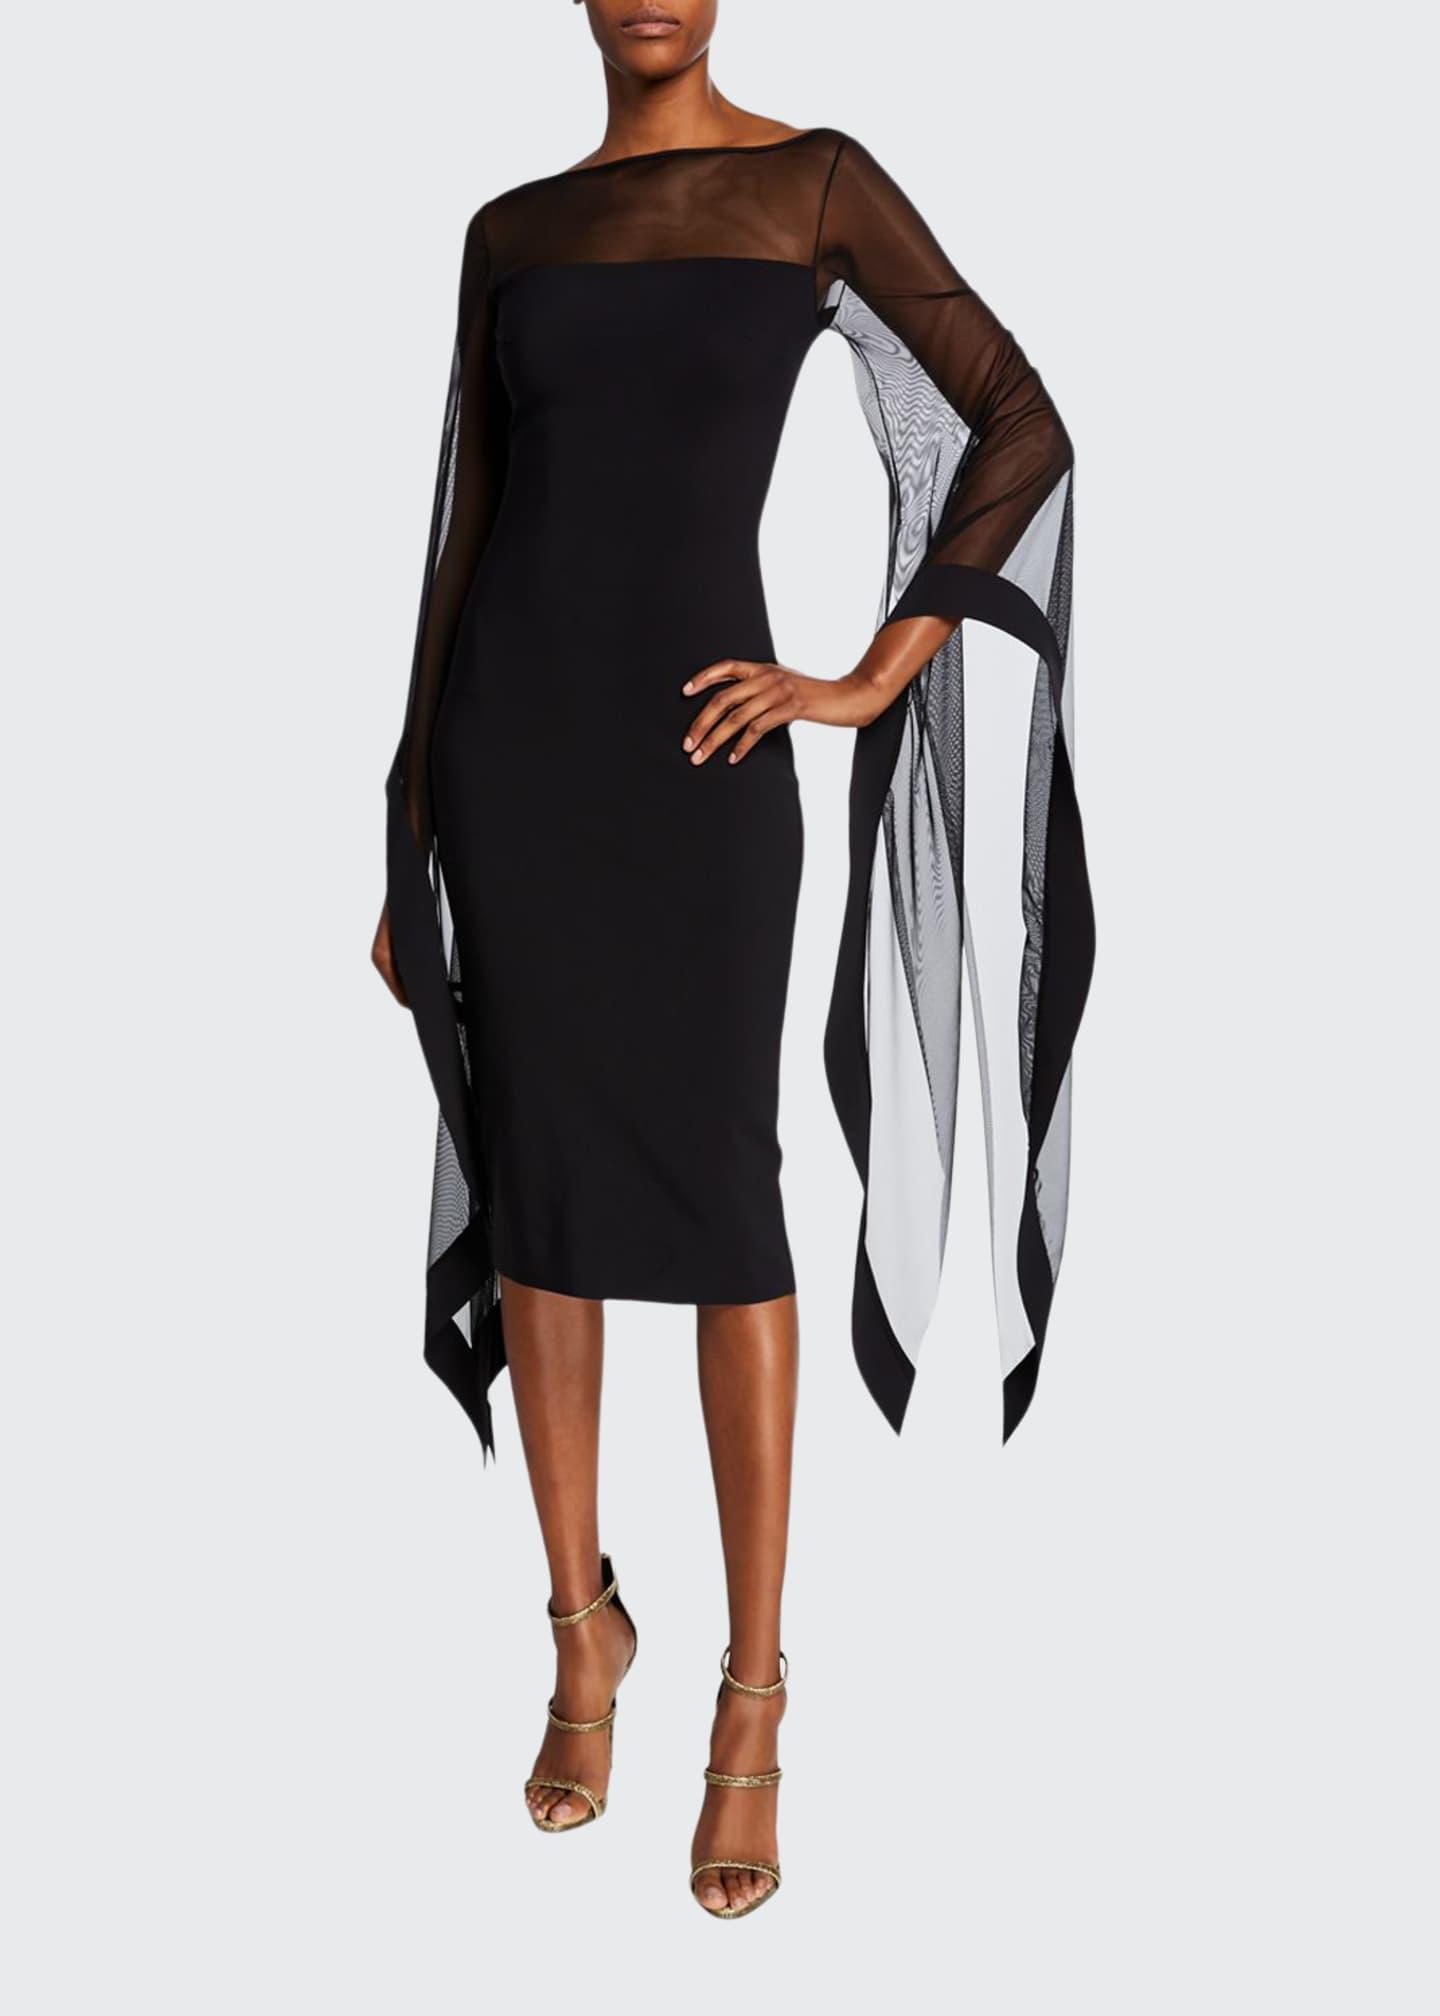 Chiara Boni La Petite Robe High-Neck Sheer Wing-Sleeve